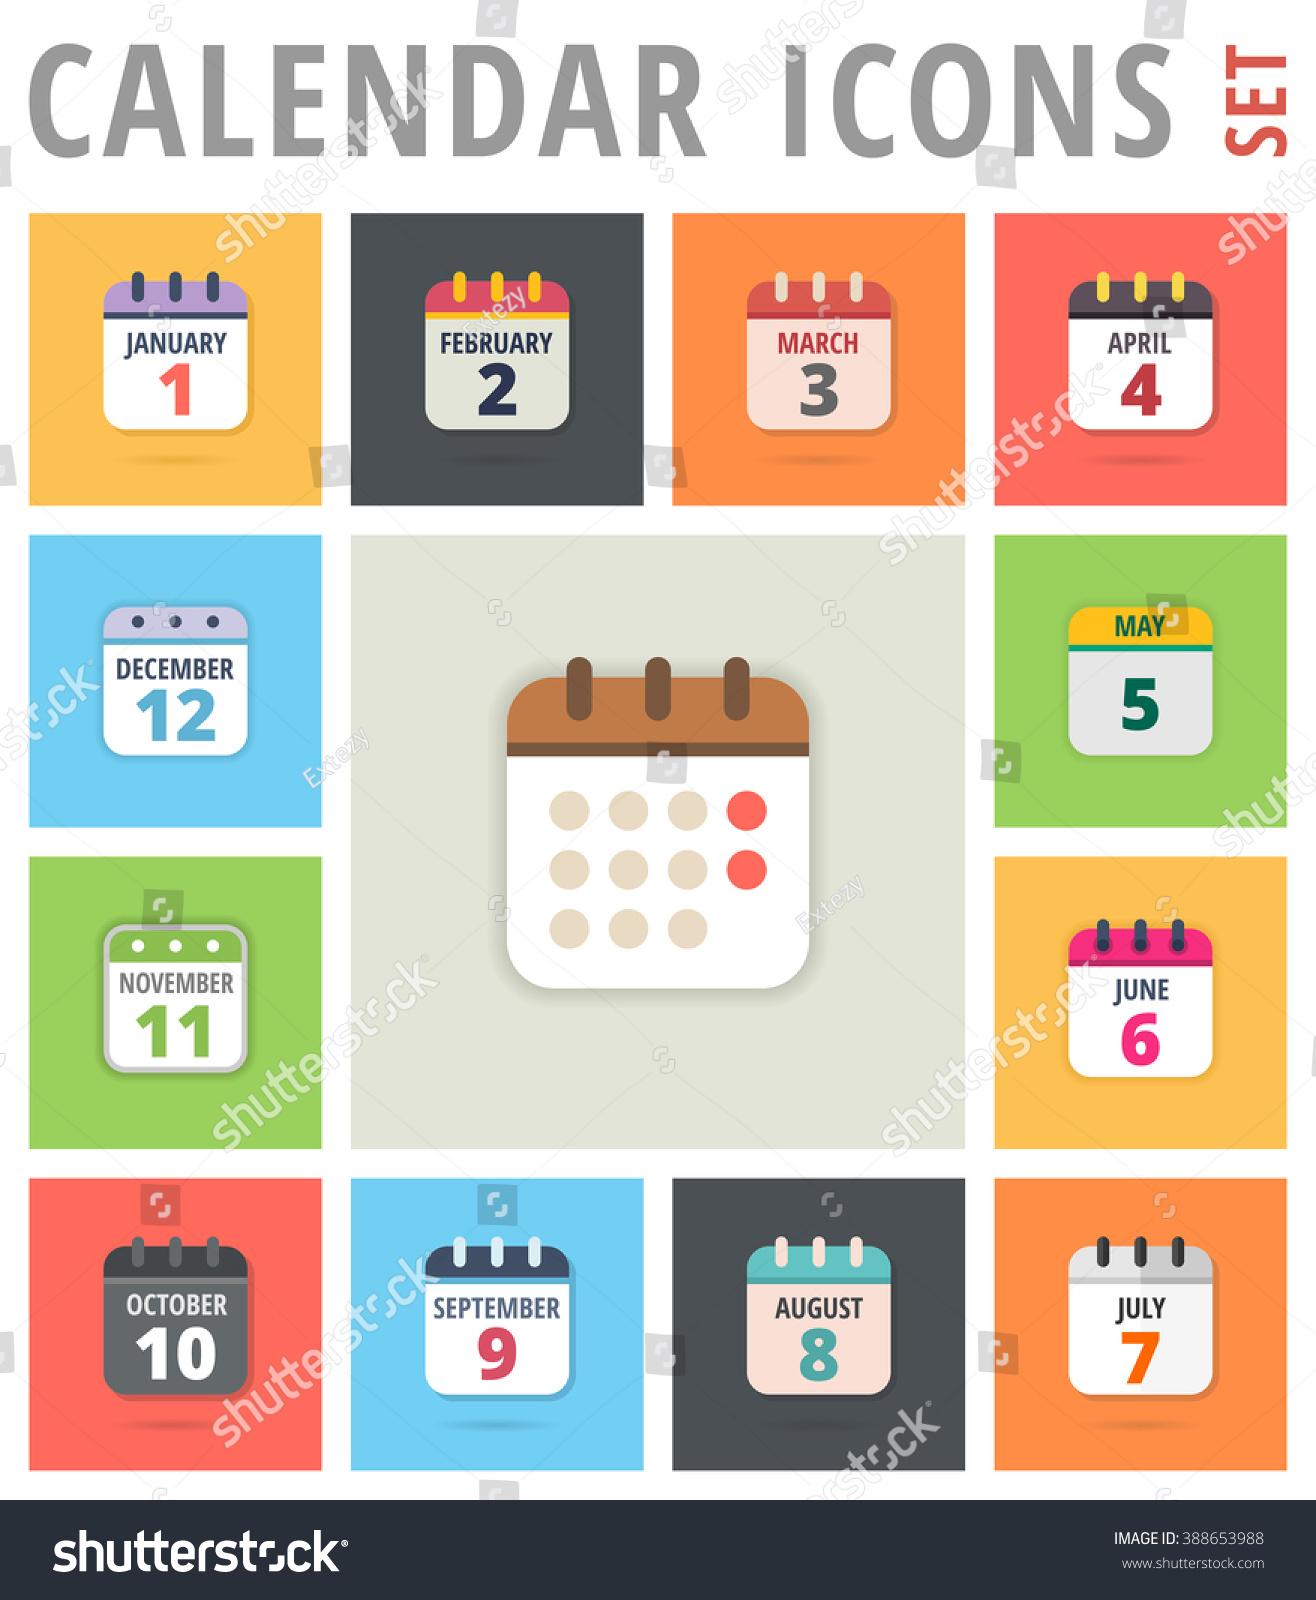 Calendar Logo : Calendar icon set vector emblem picture stock